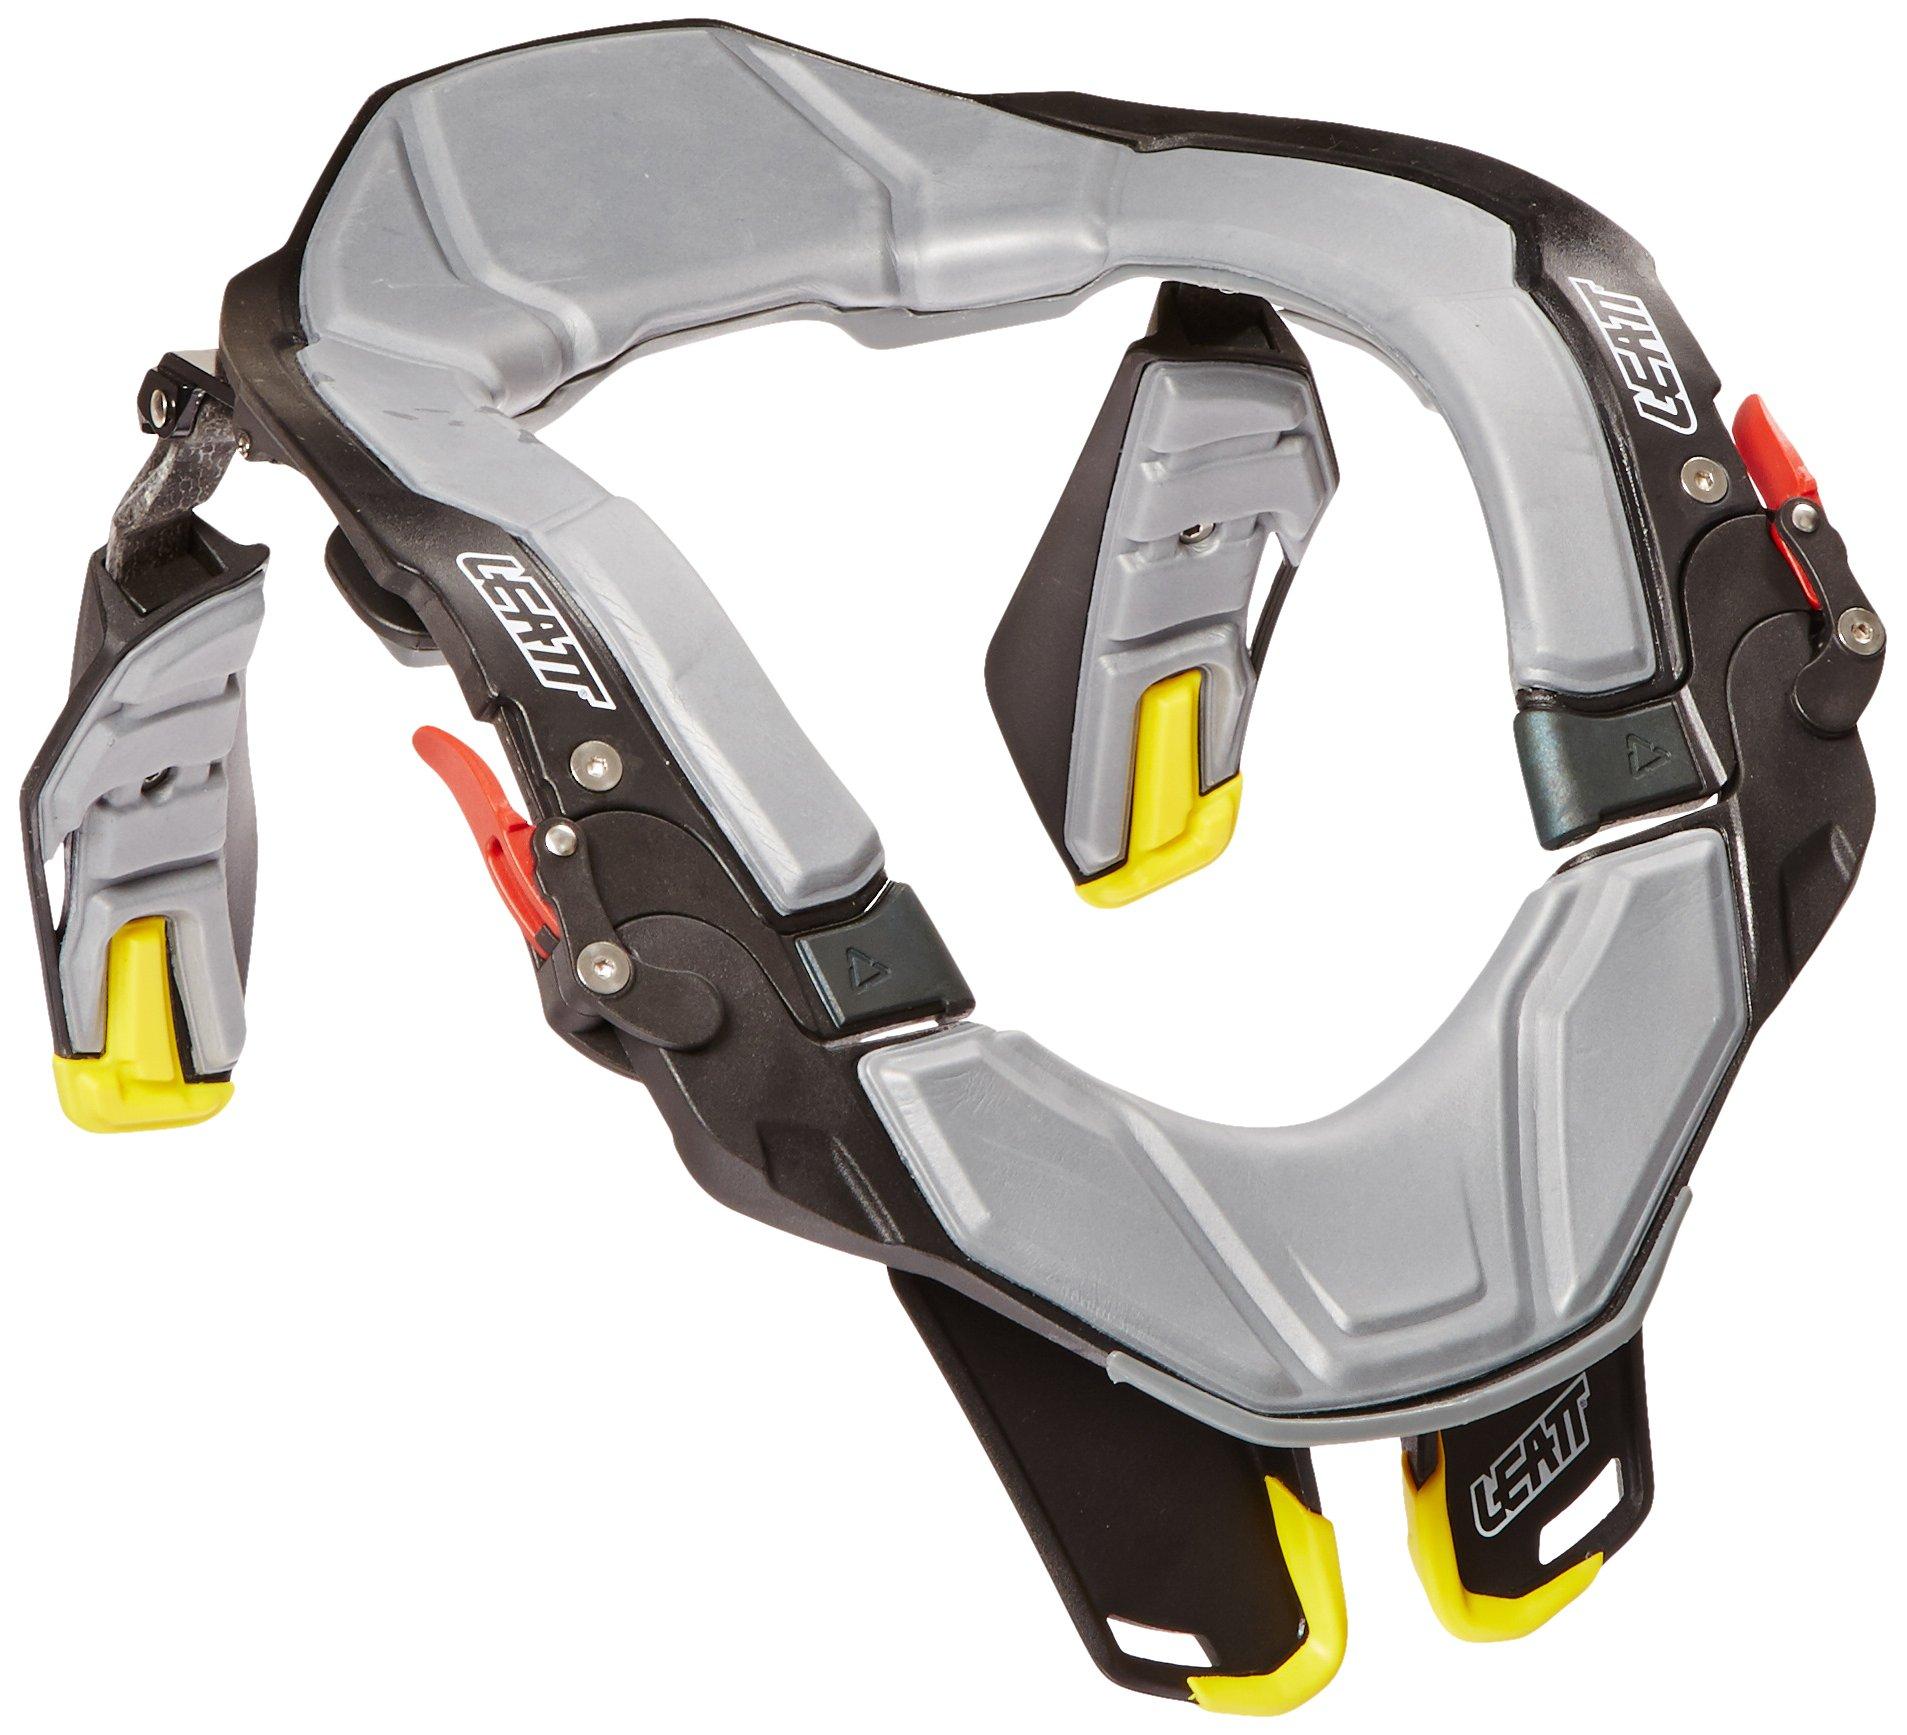 Leatt STX Road Neck Brace (Black/Grey/Yellow, Large/X-Large)